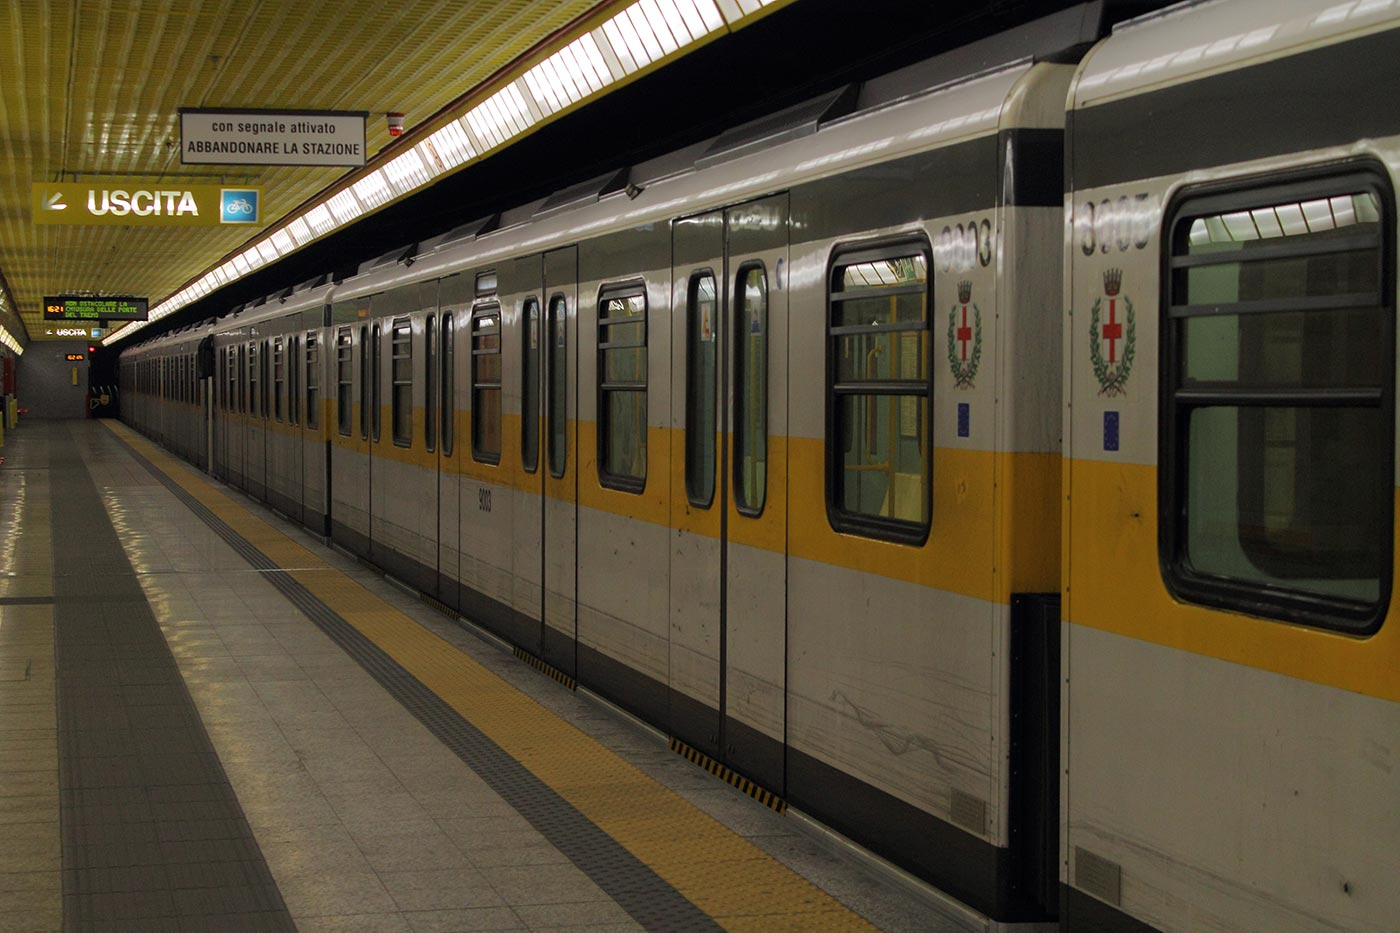 comasina_milan_metro_-_linea_3_-_train